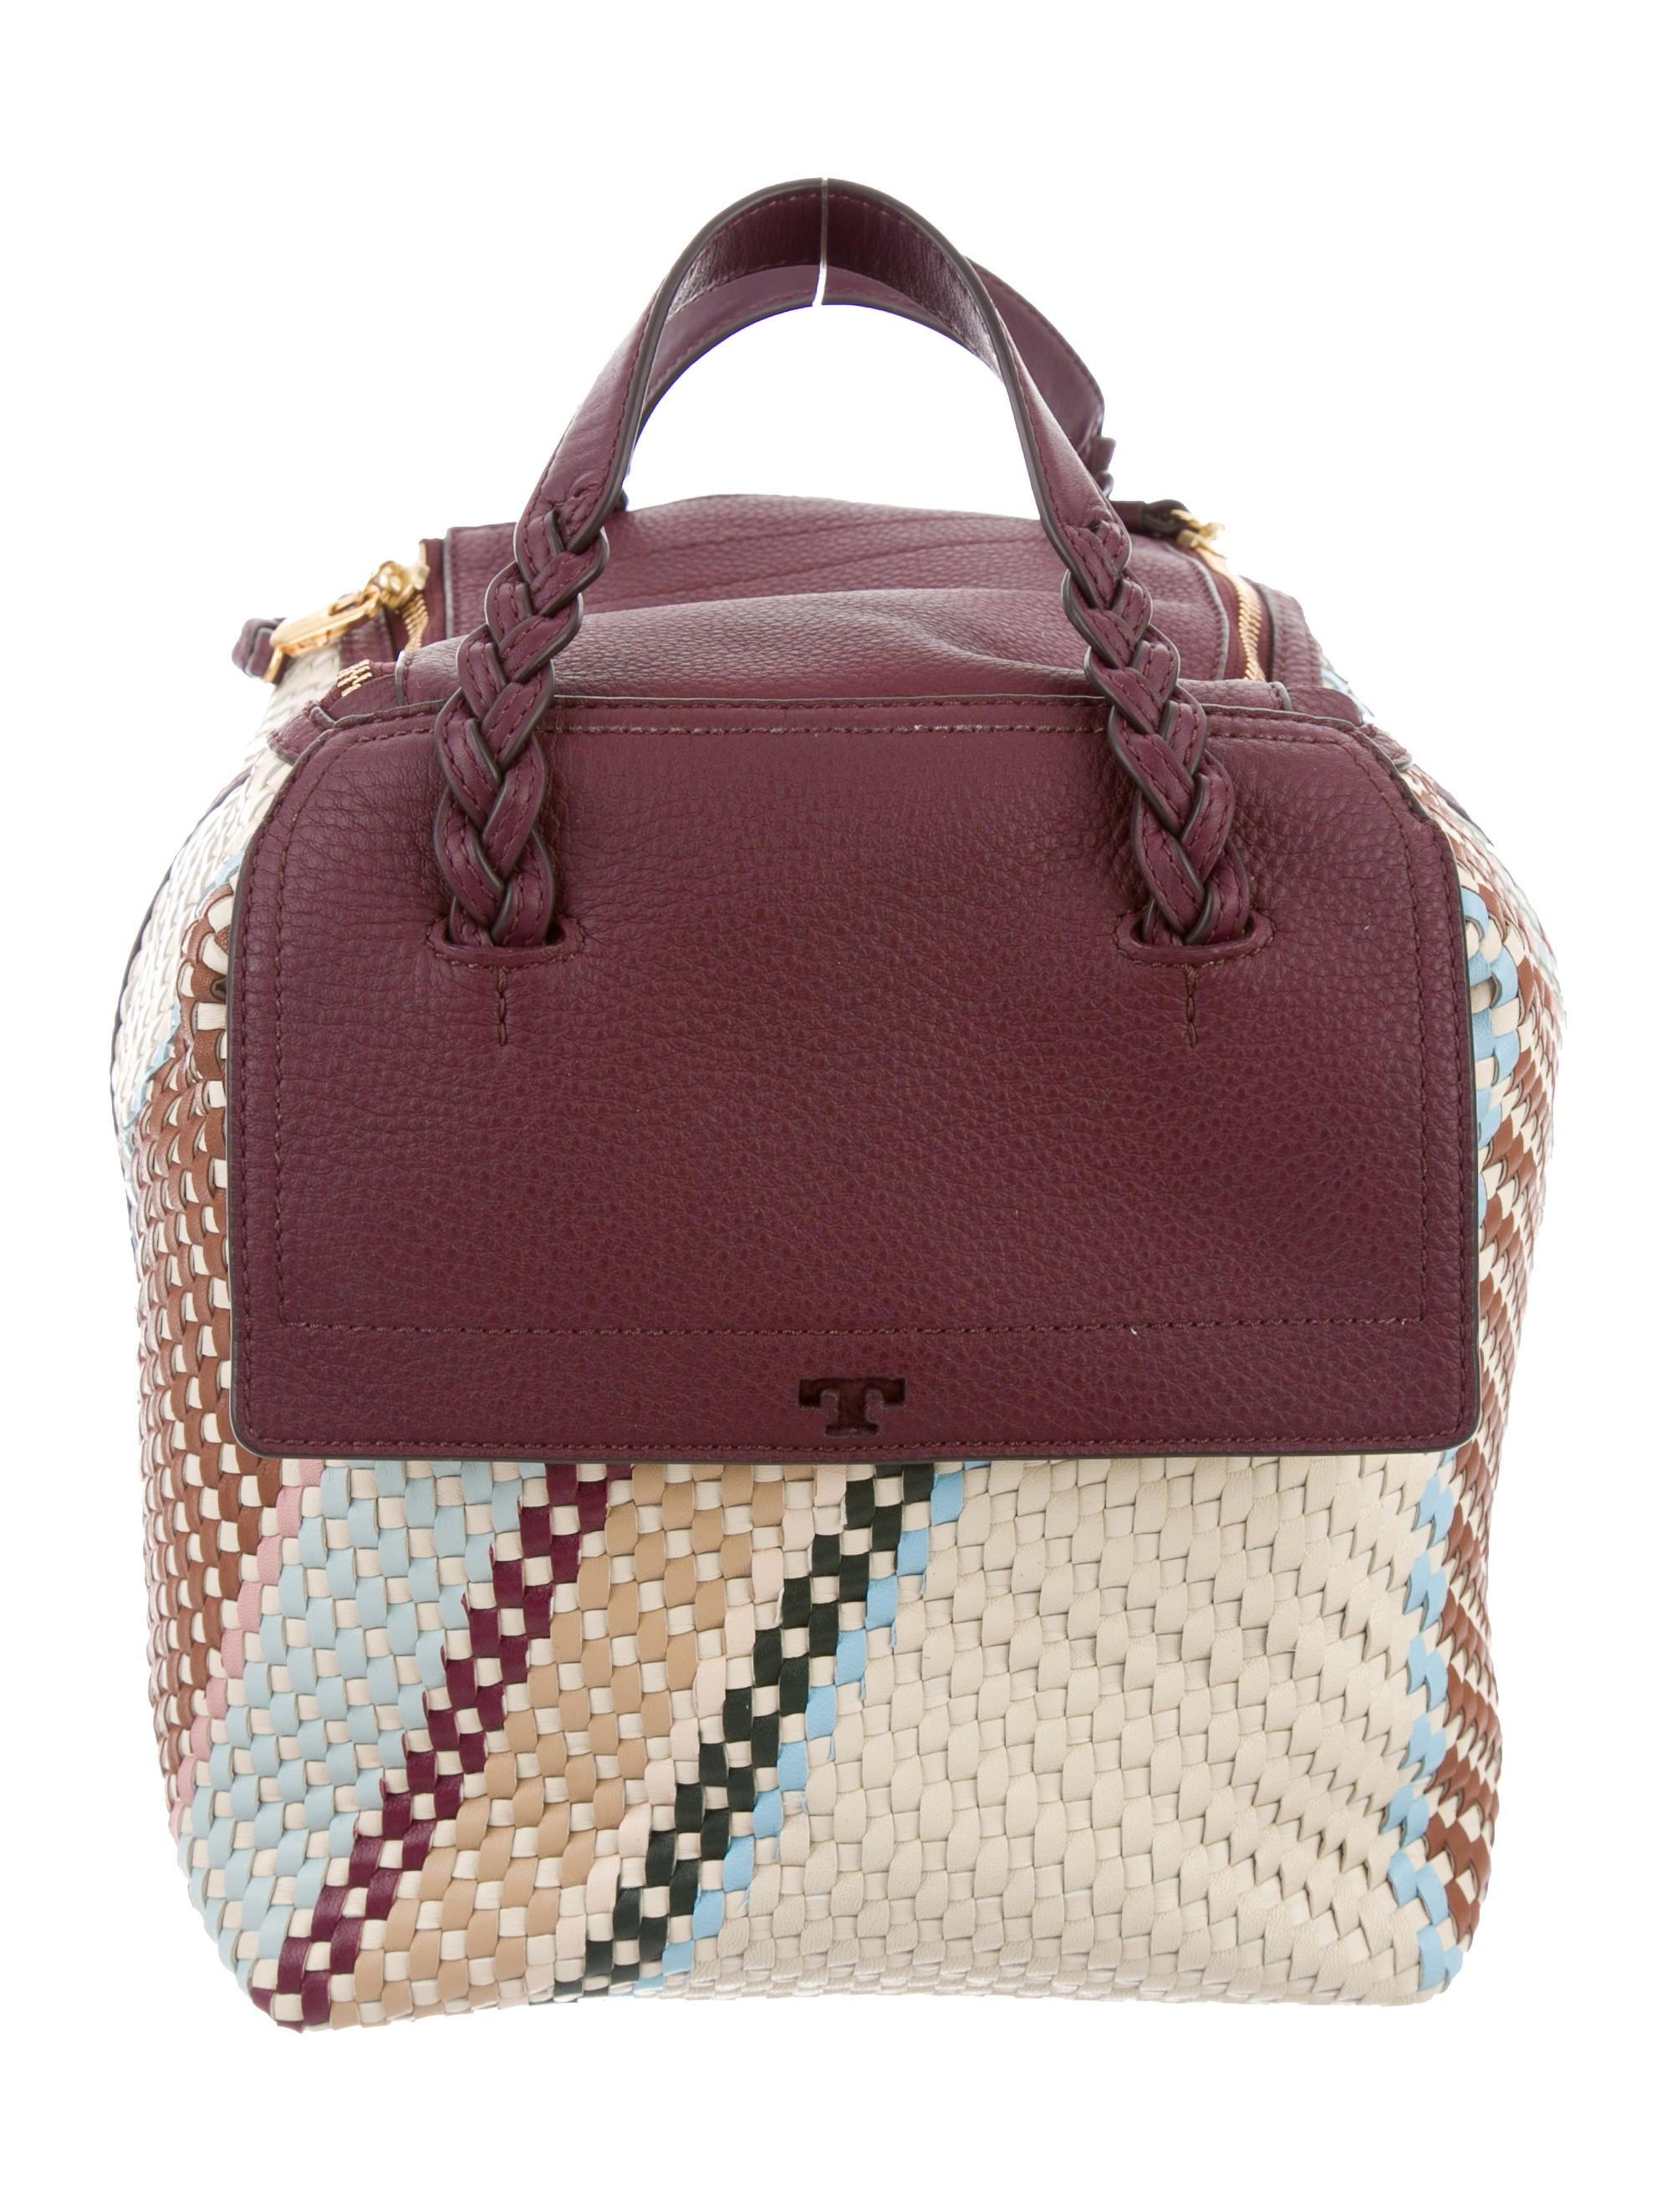 55ddebaf1df0 Tory Burch Half Moon Woven Mini Satchel w  Tags - Handbags ...